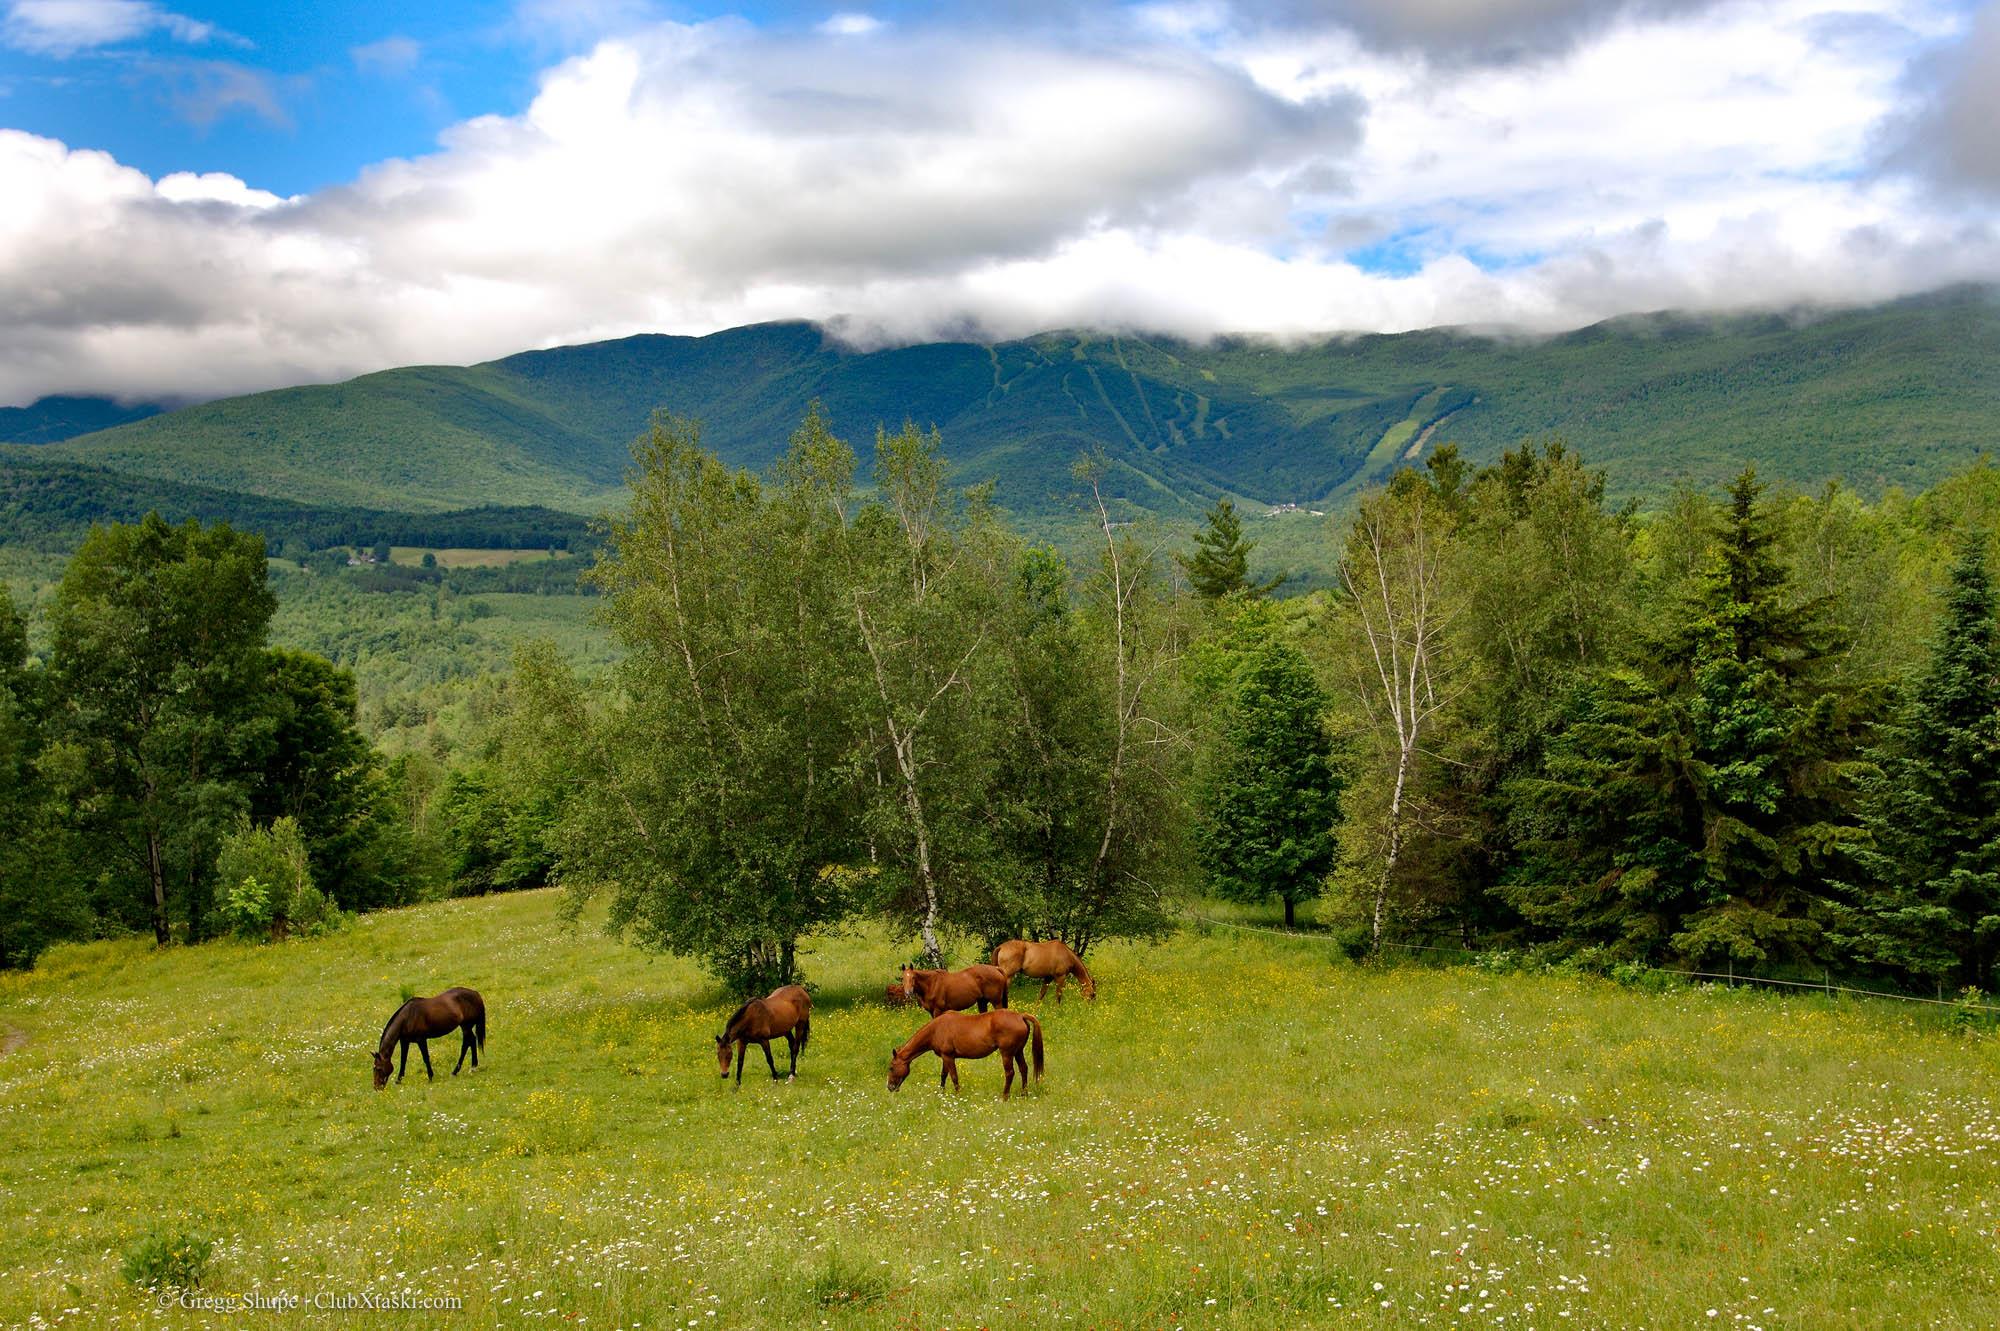 Horses in backyard